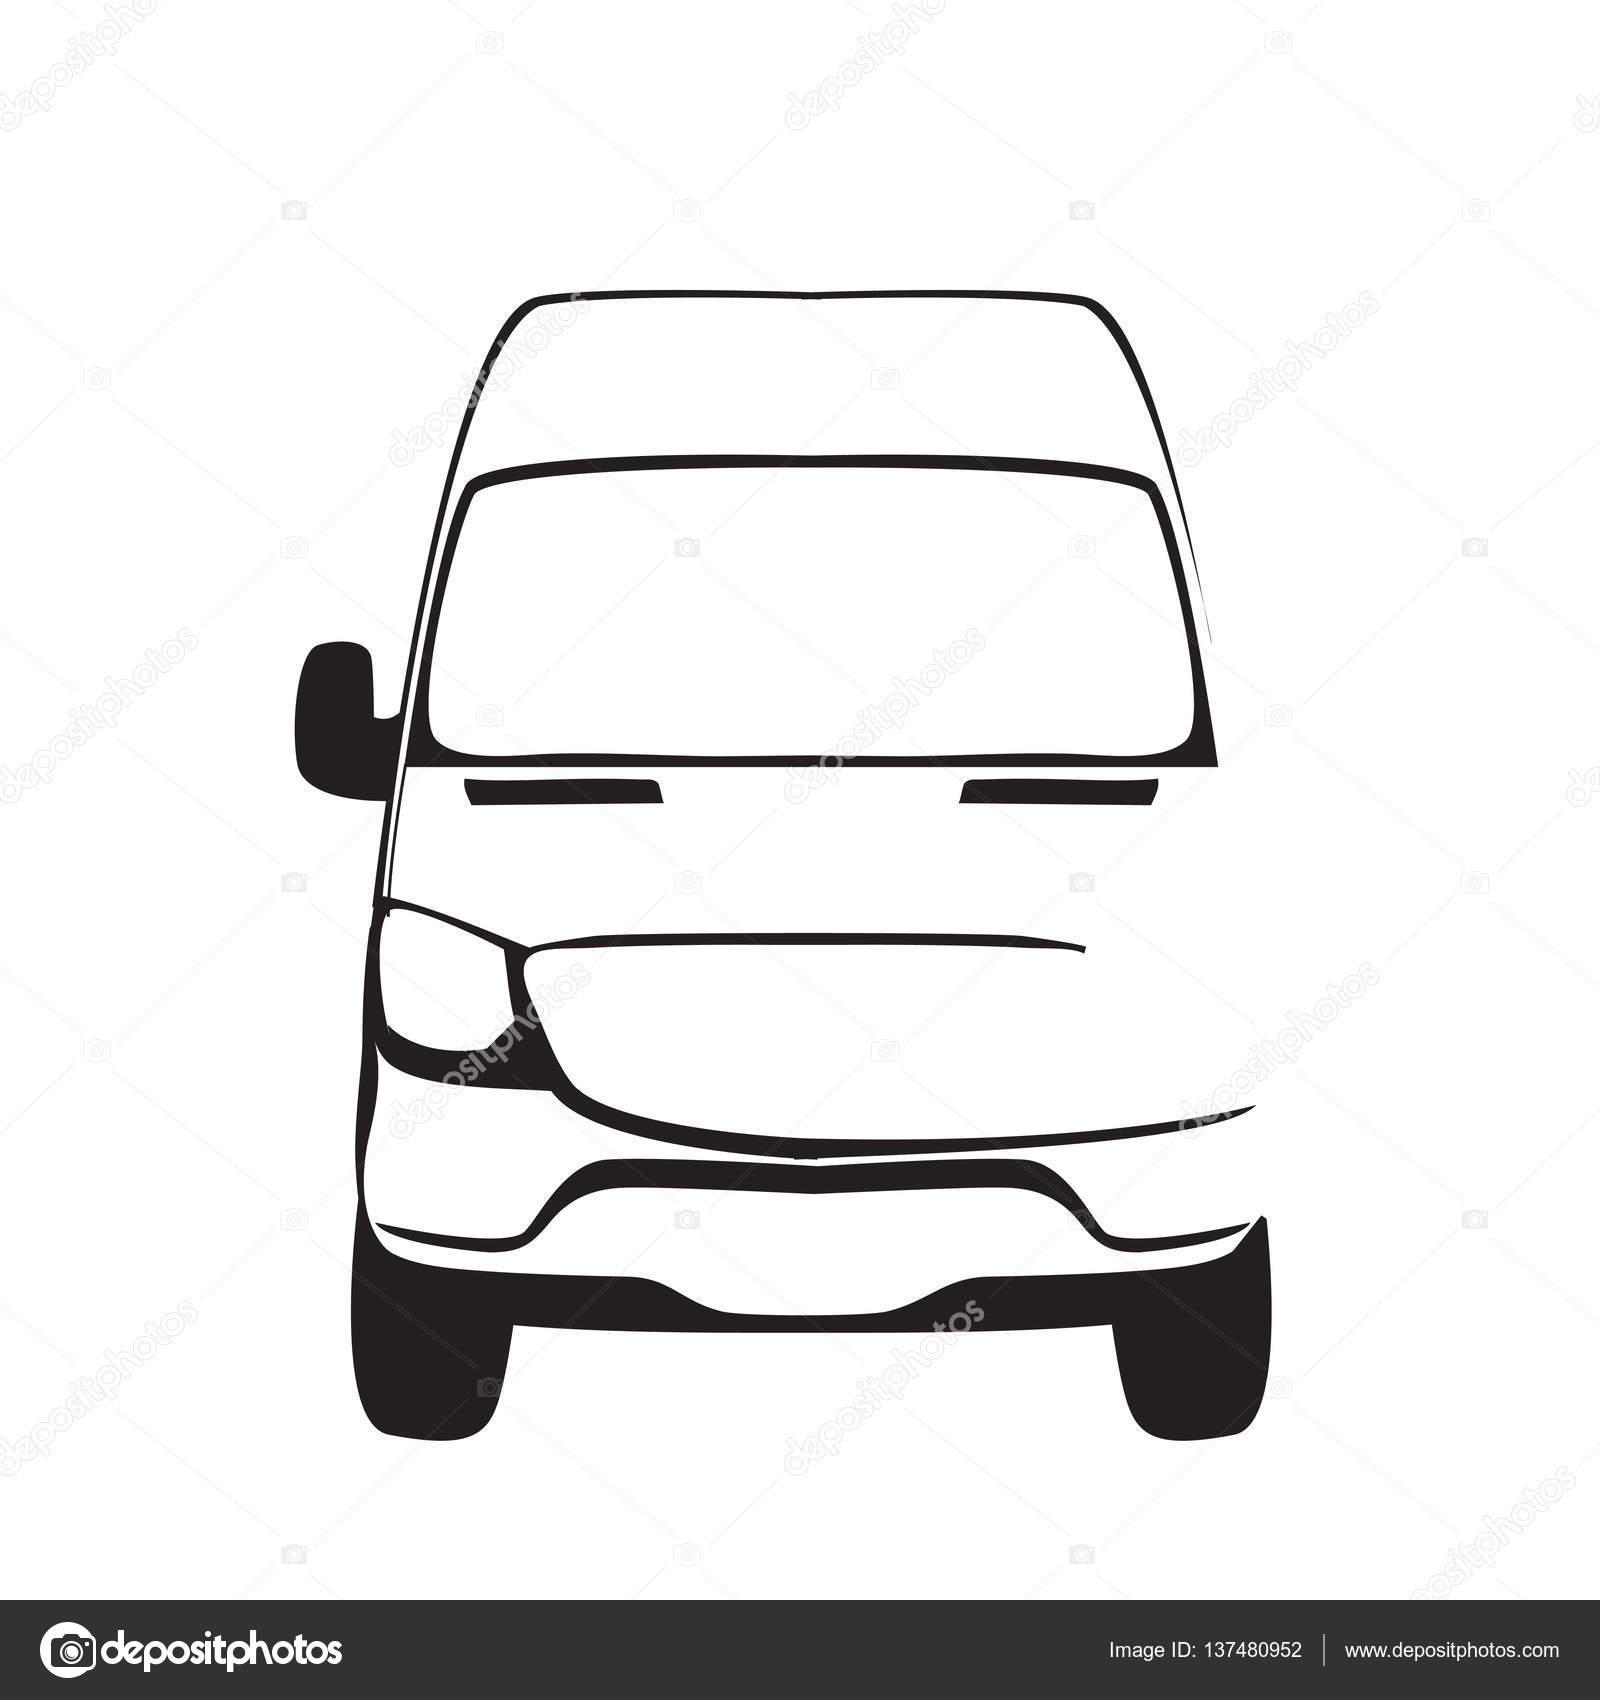 Etiqueta servicio reparación o entrega de coche. Plantilla de diseño ...